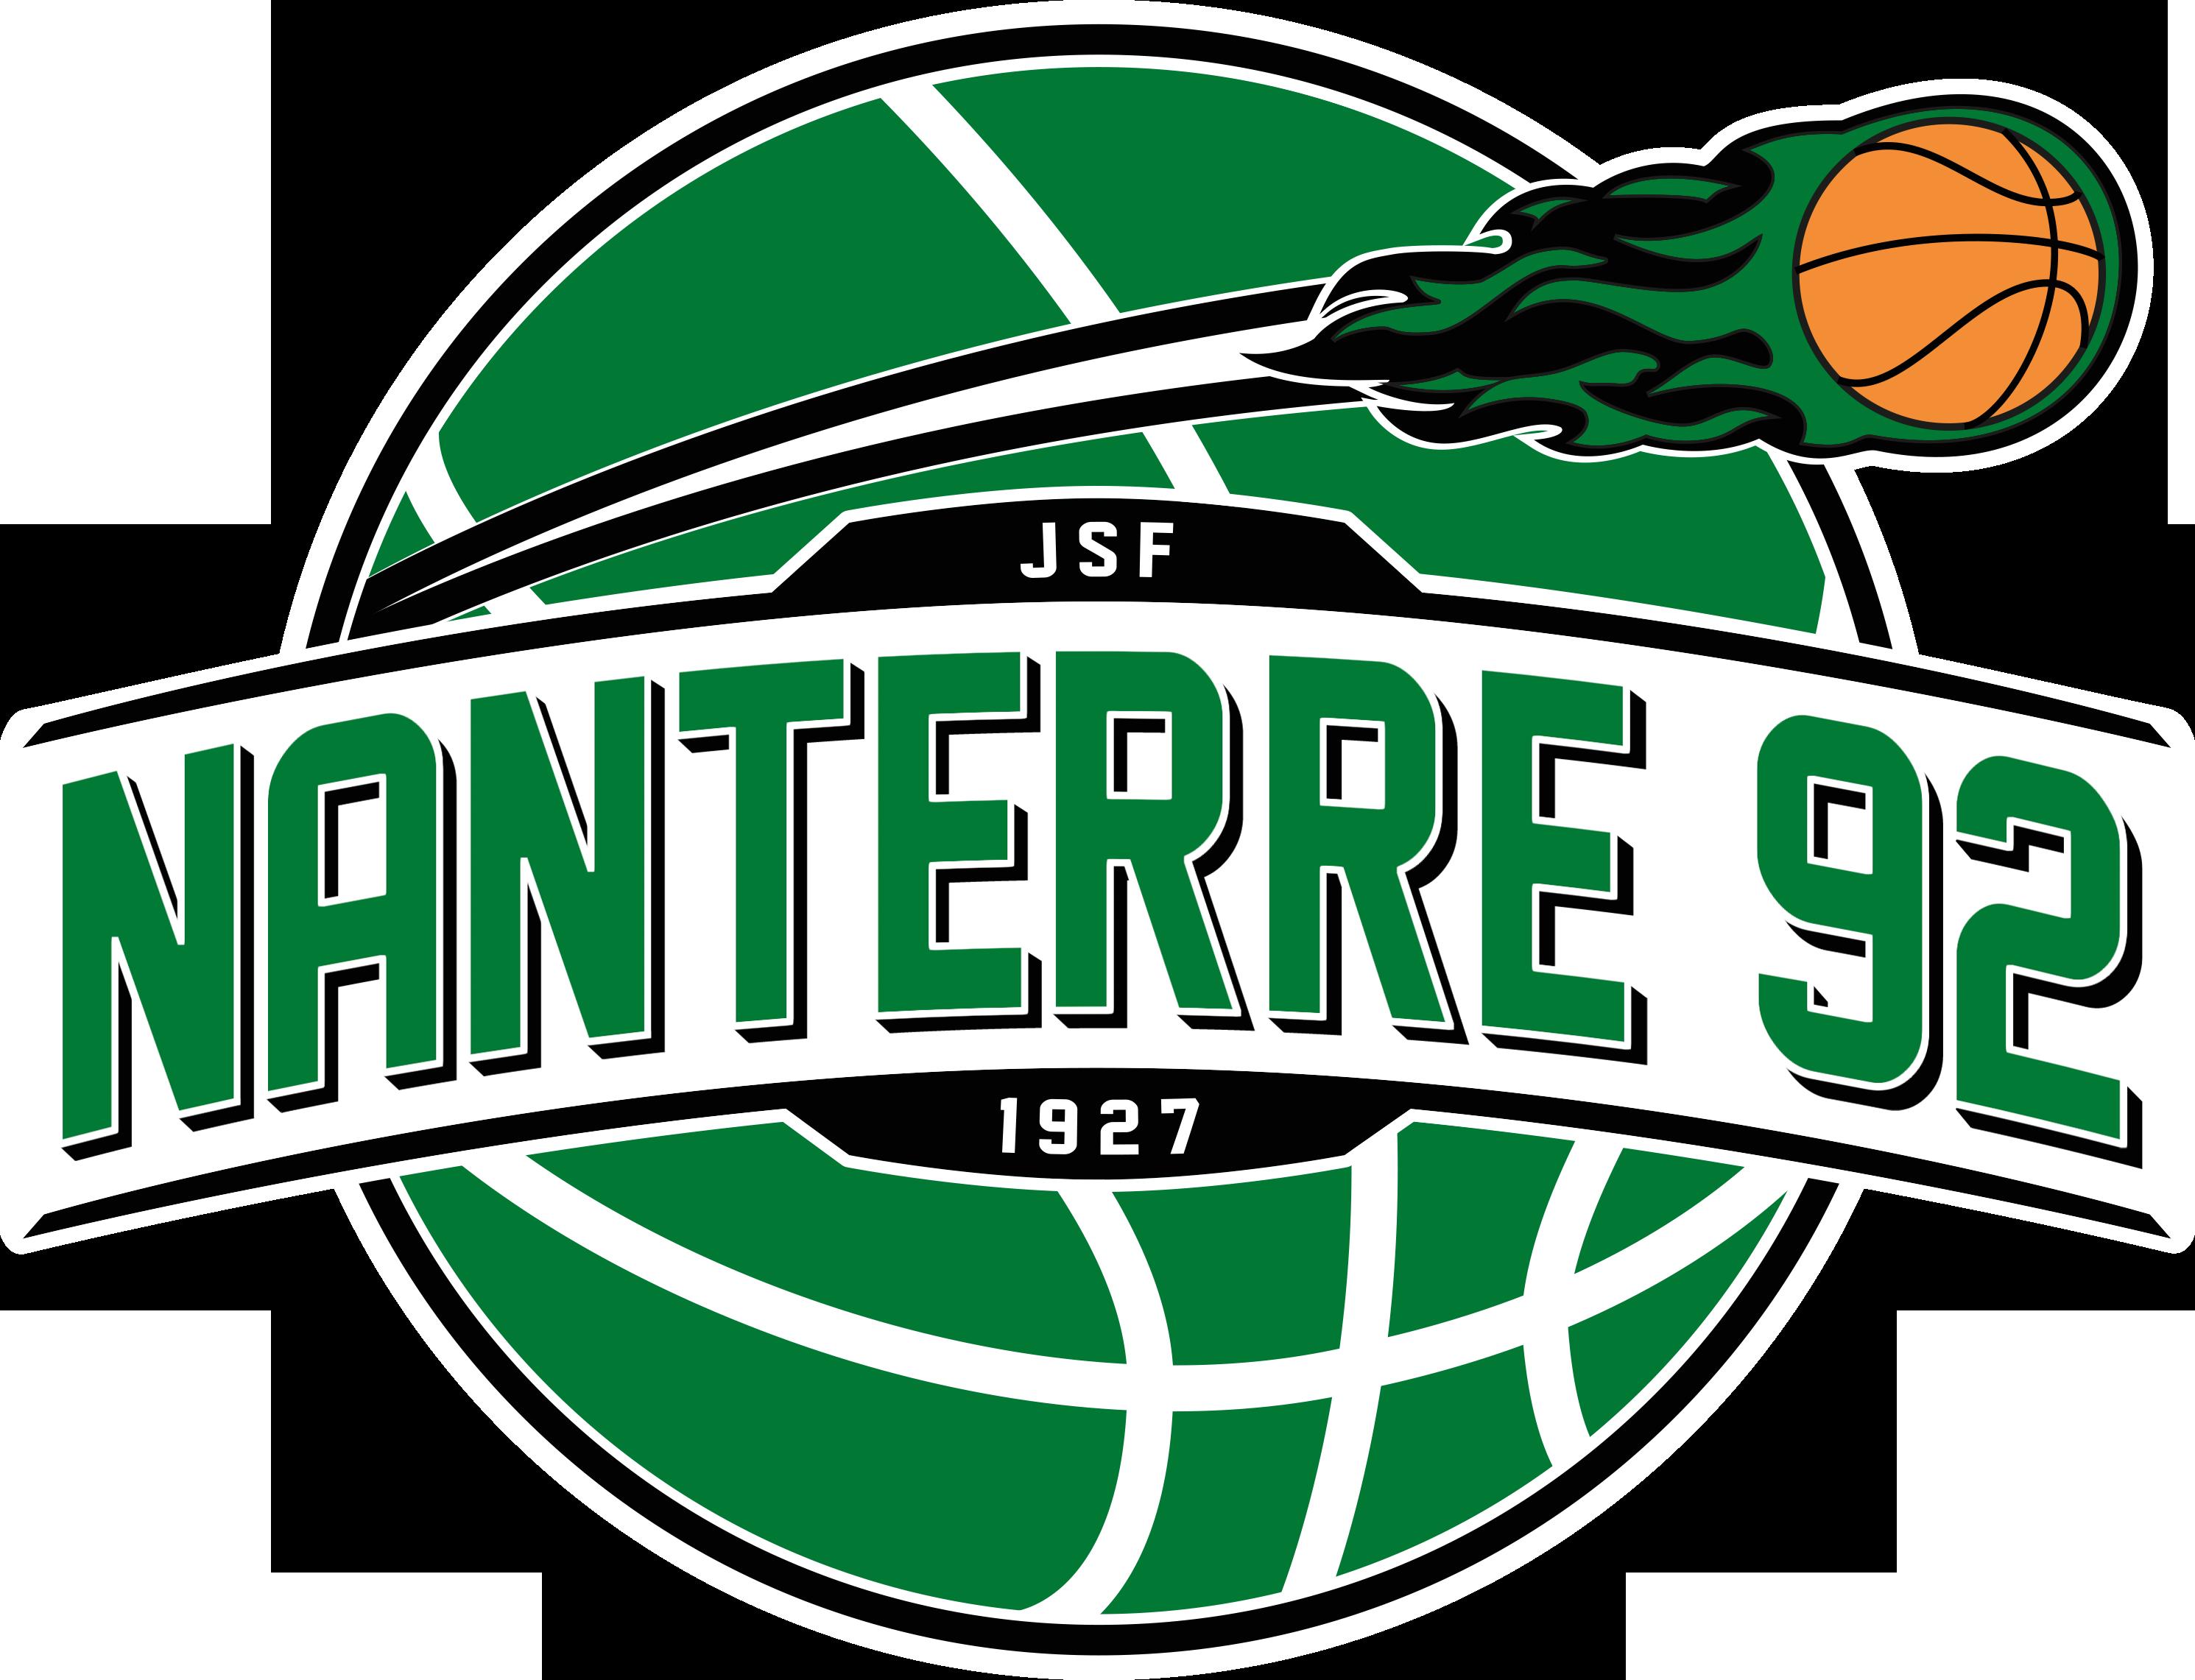 logo-nanterre-92